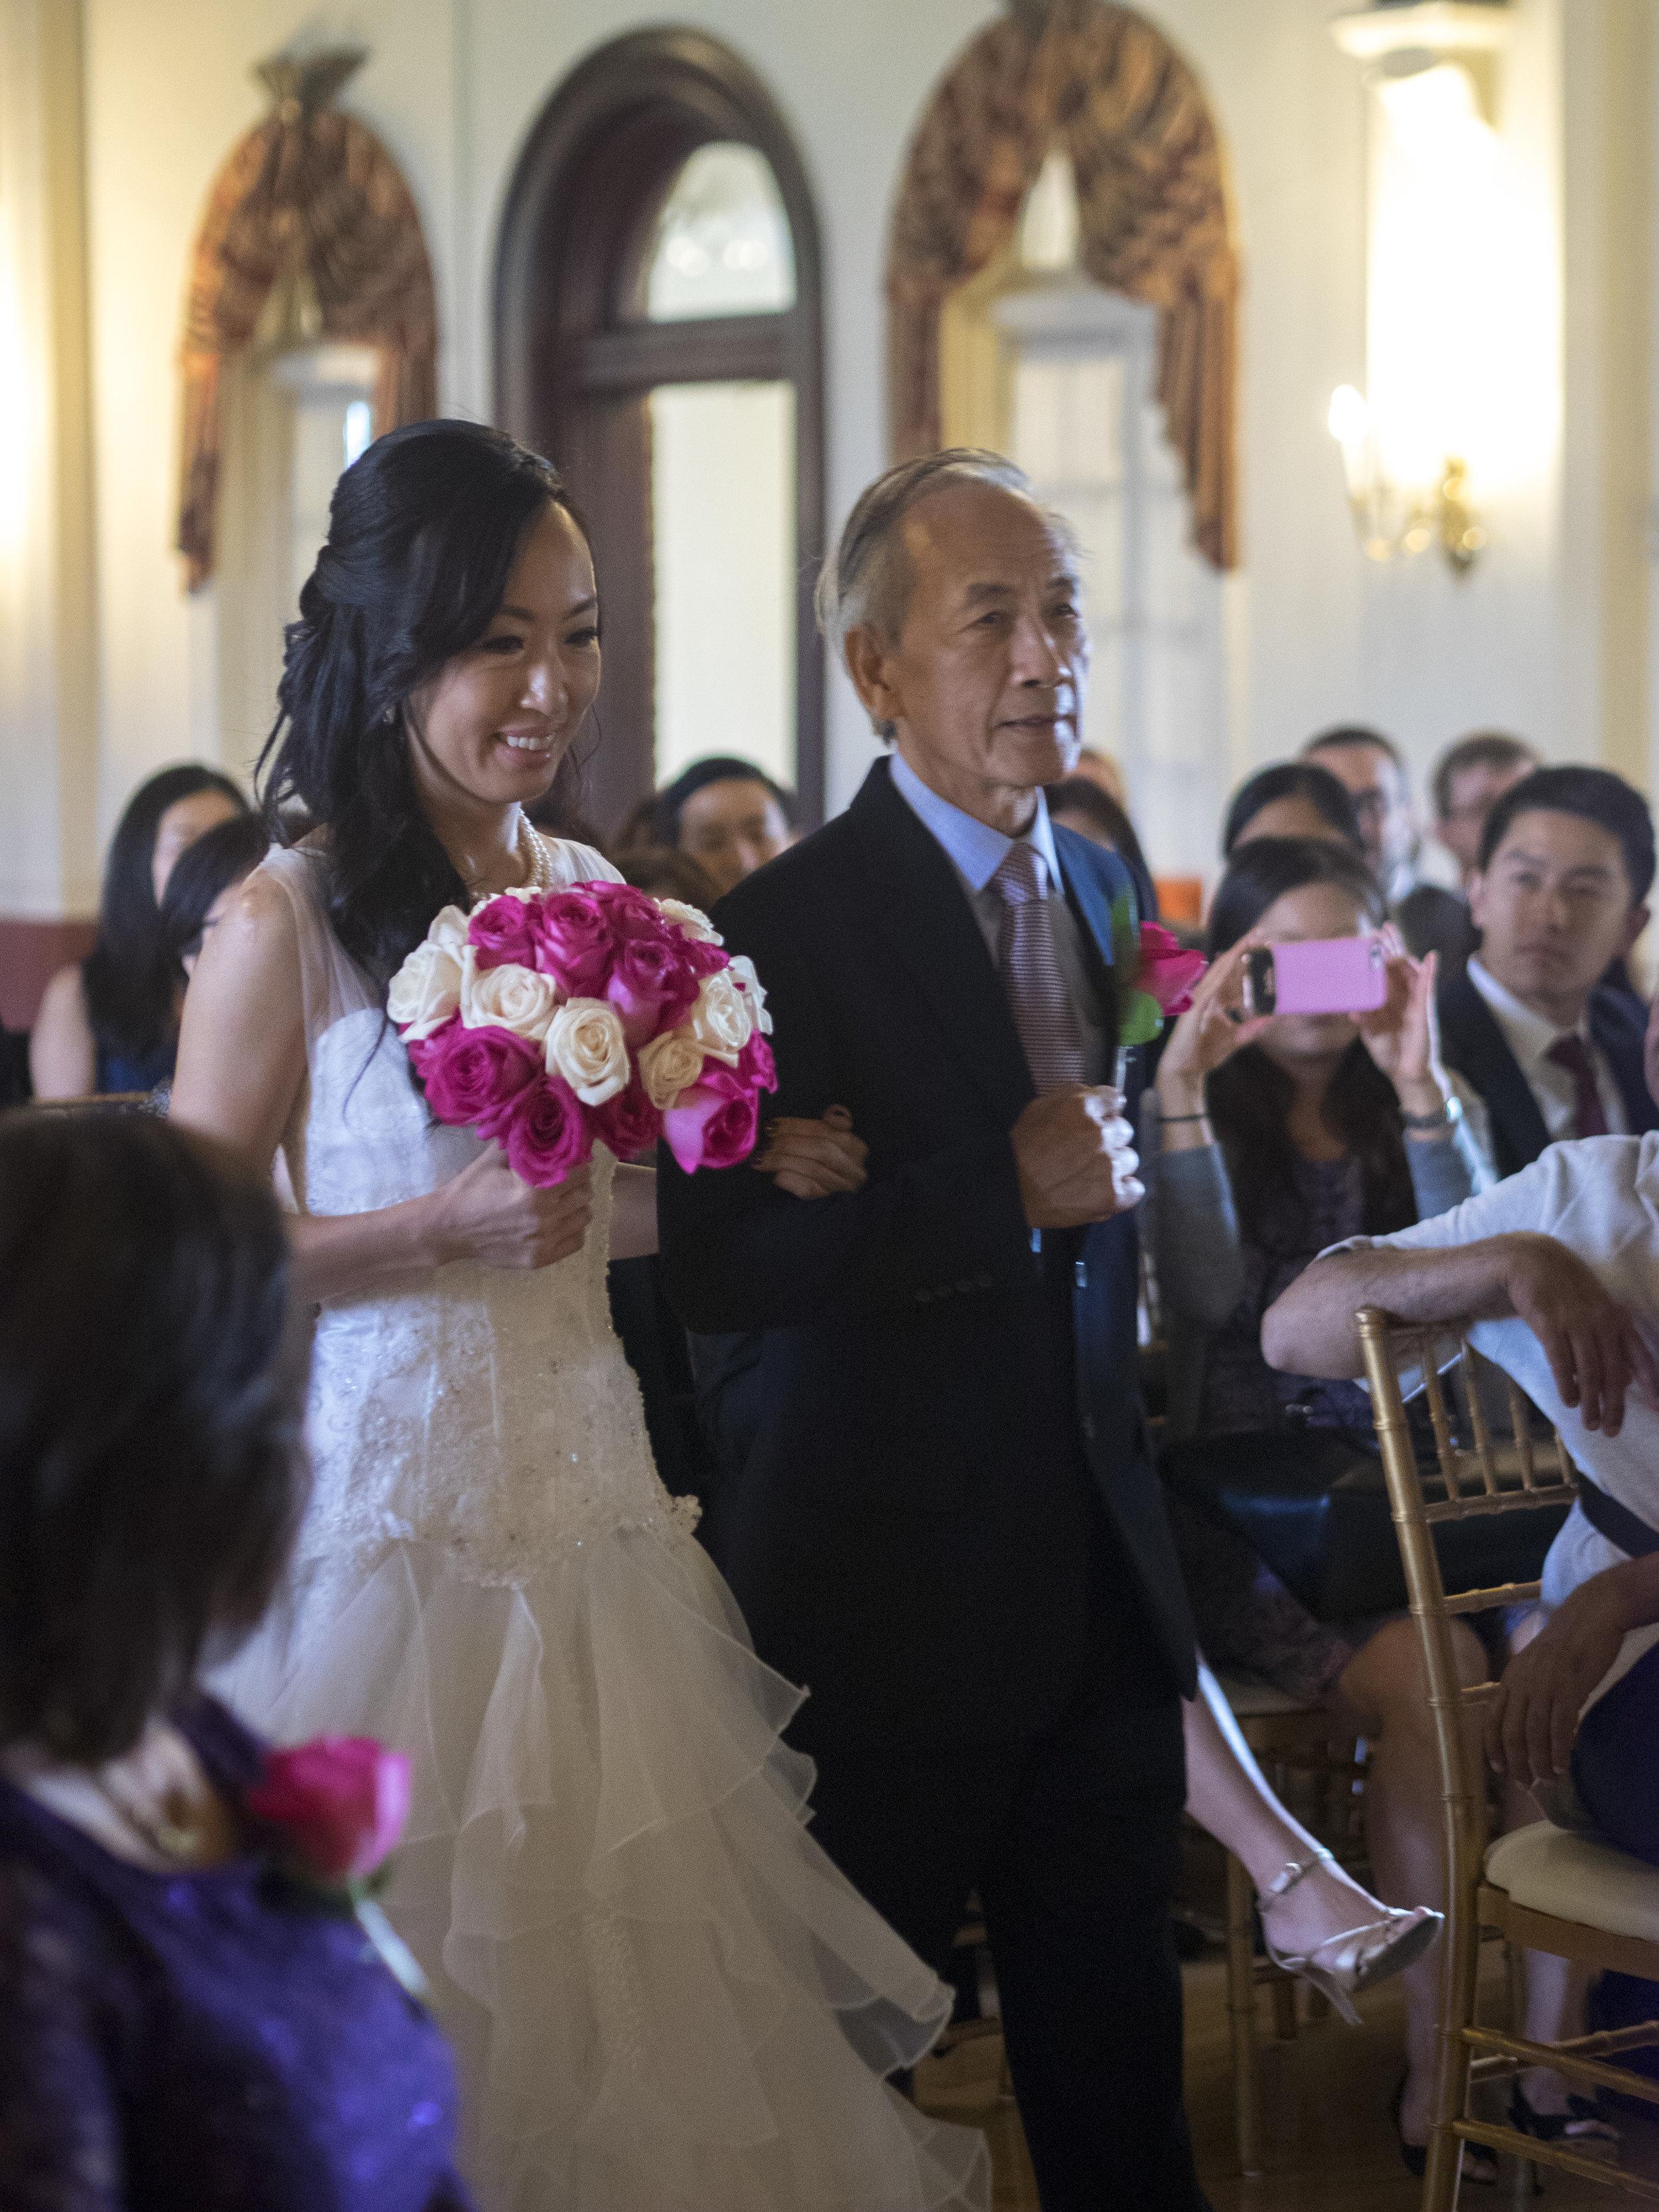 K_S bride.jpg